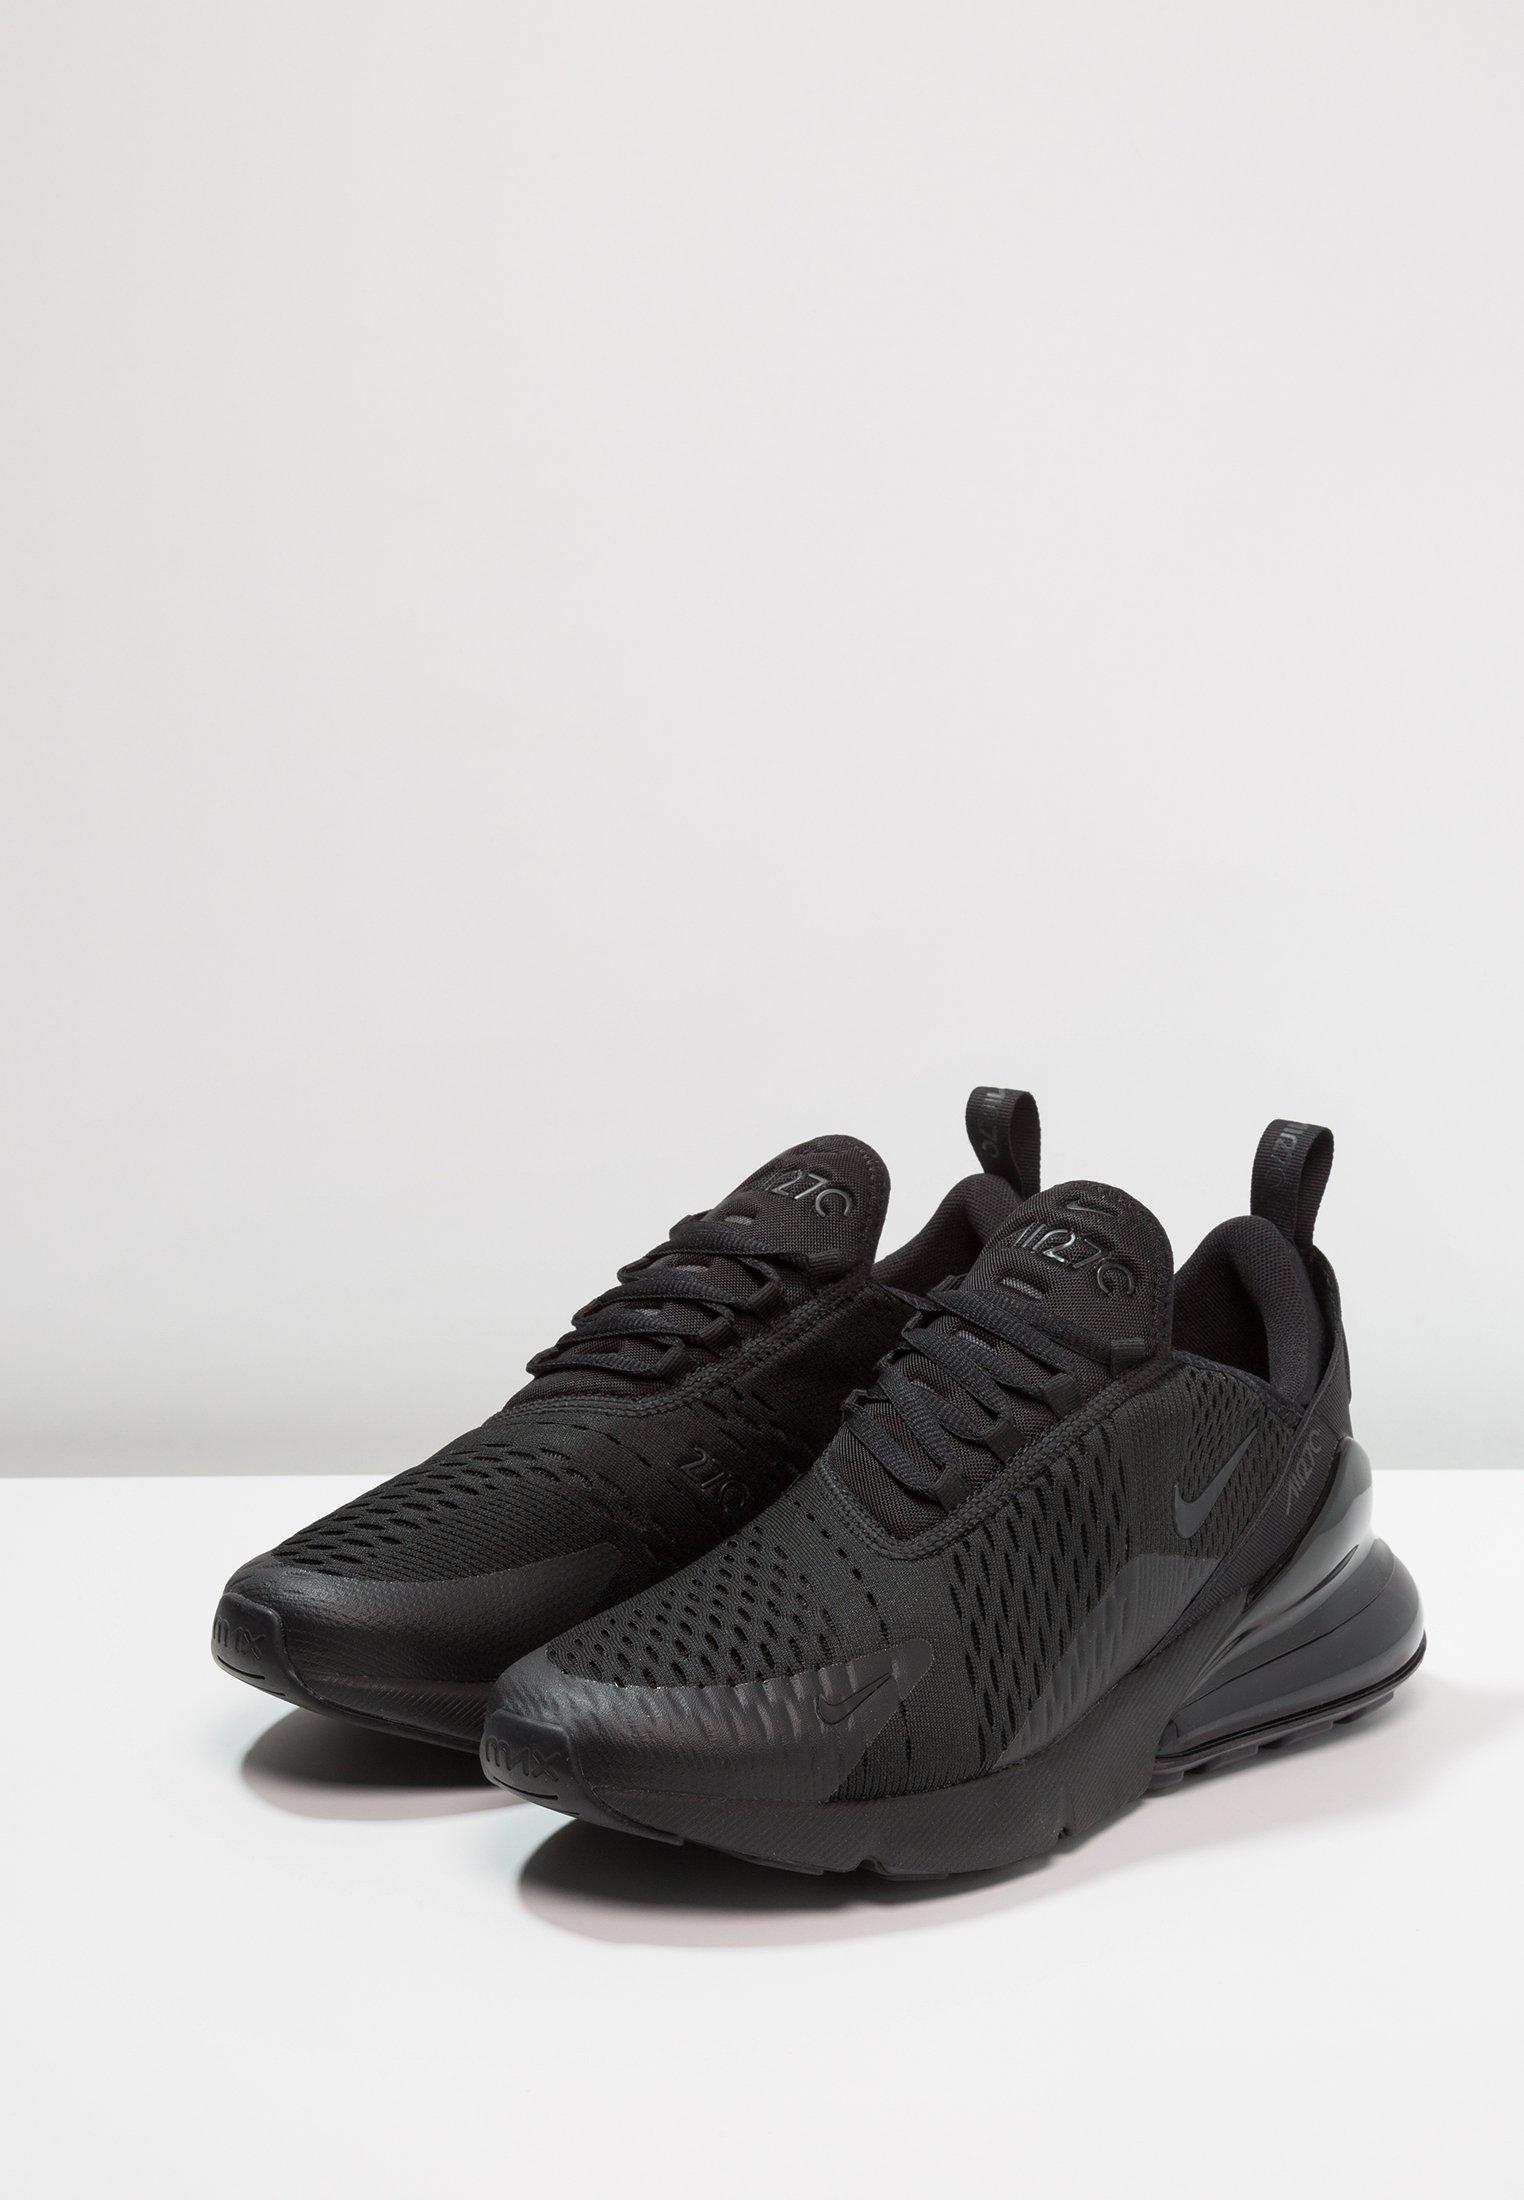 Nike Sportswear Air Max 270 - Baskets Basses Black